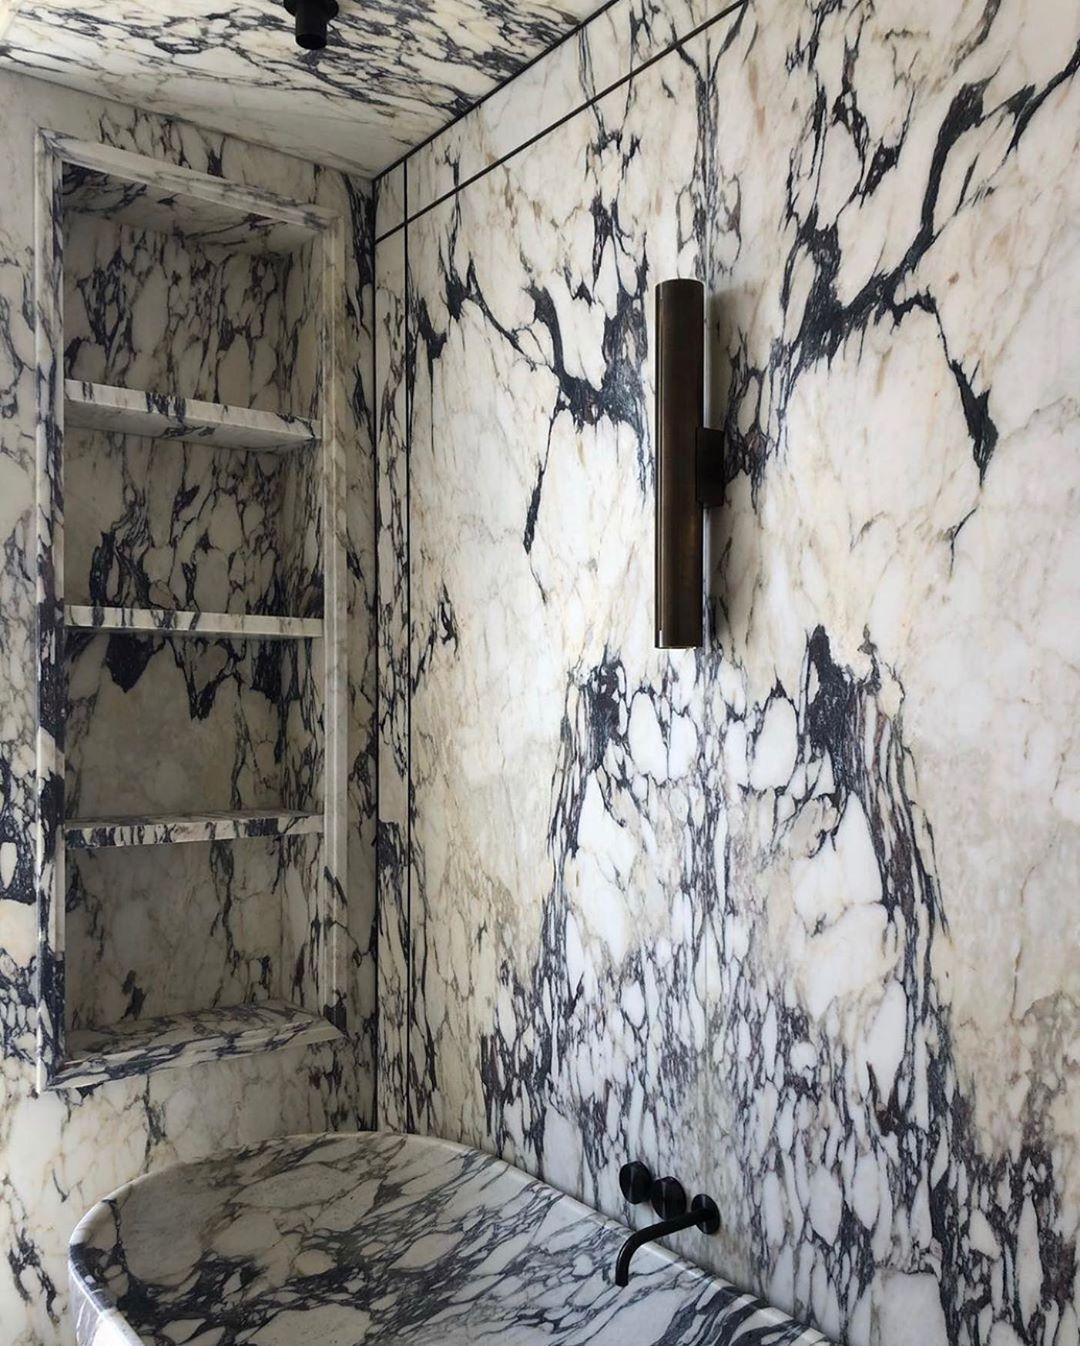 "LP CREATIVE DESIGN on Instagram: ""On a bit of stone bathroom bender... this masterpiece c/o @felixmillory • • • #stone #marble #marbledesign #bathrooms #bathroomdesign…"""